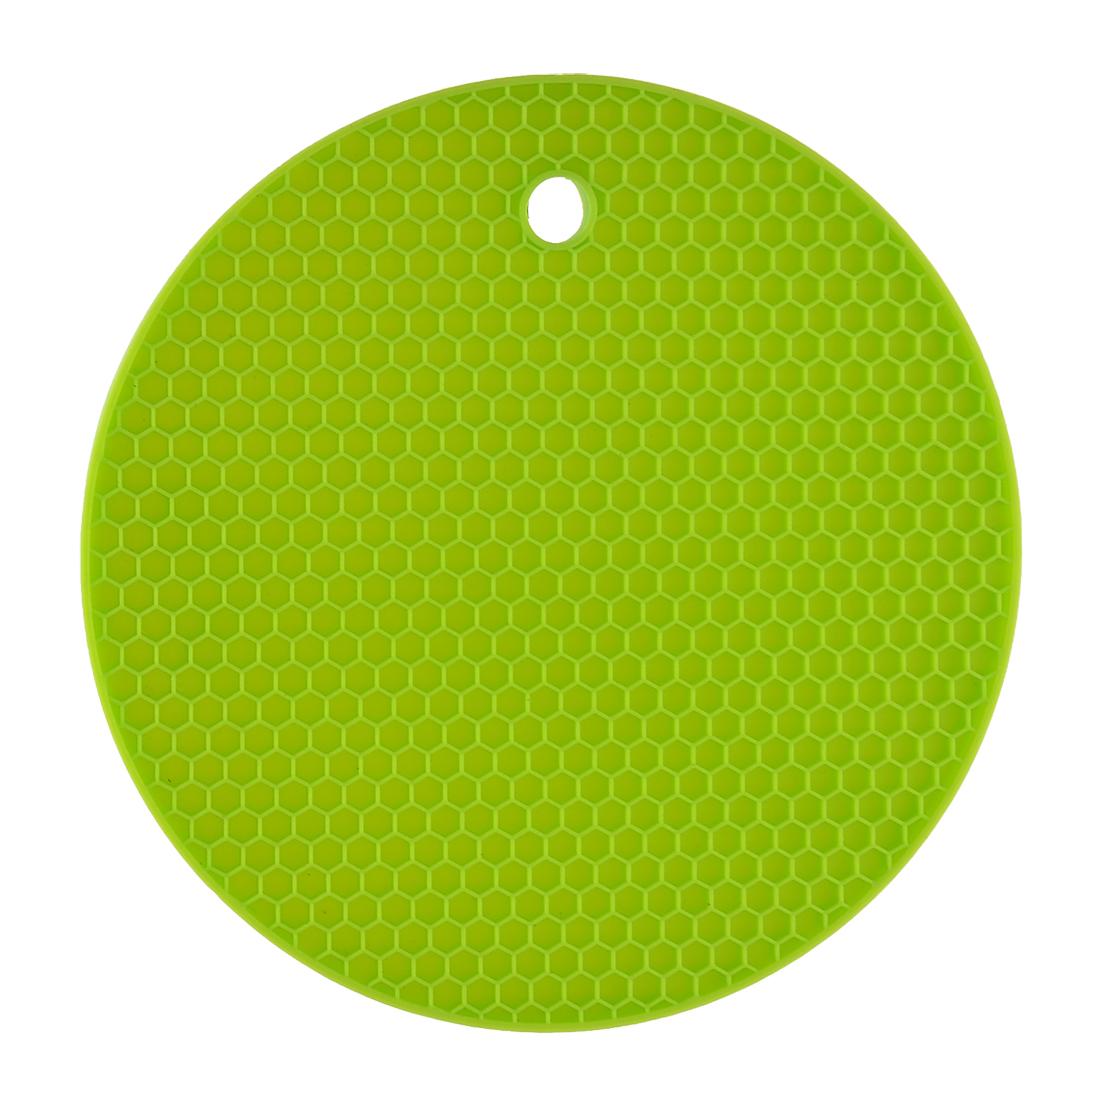 Kitchen Hot Pot Pan Trivet Nonslip Heat Insulated Placemat Pad Holder Green